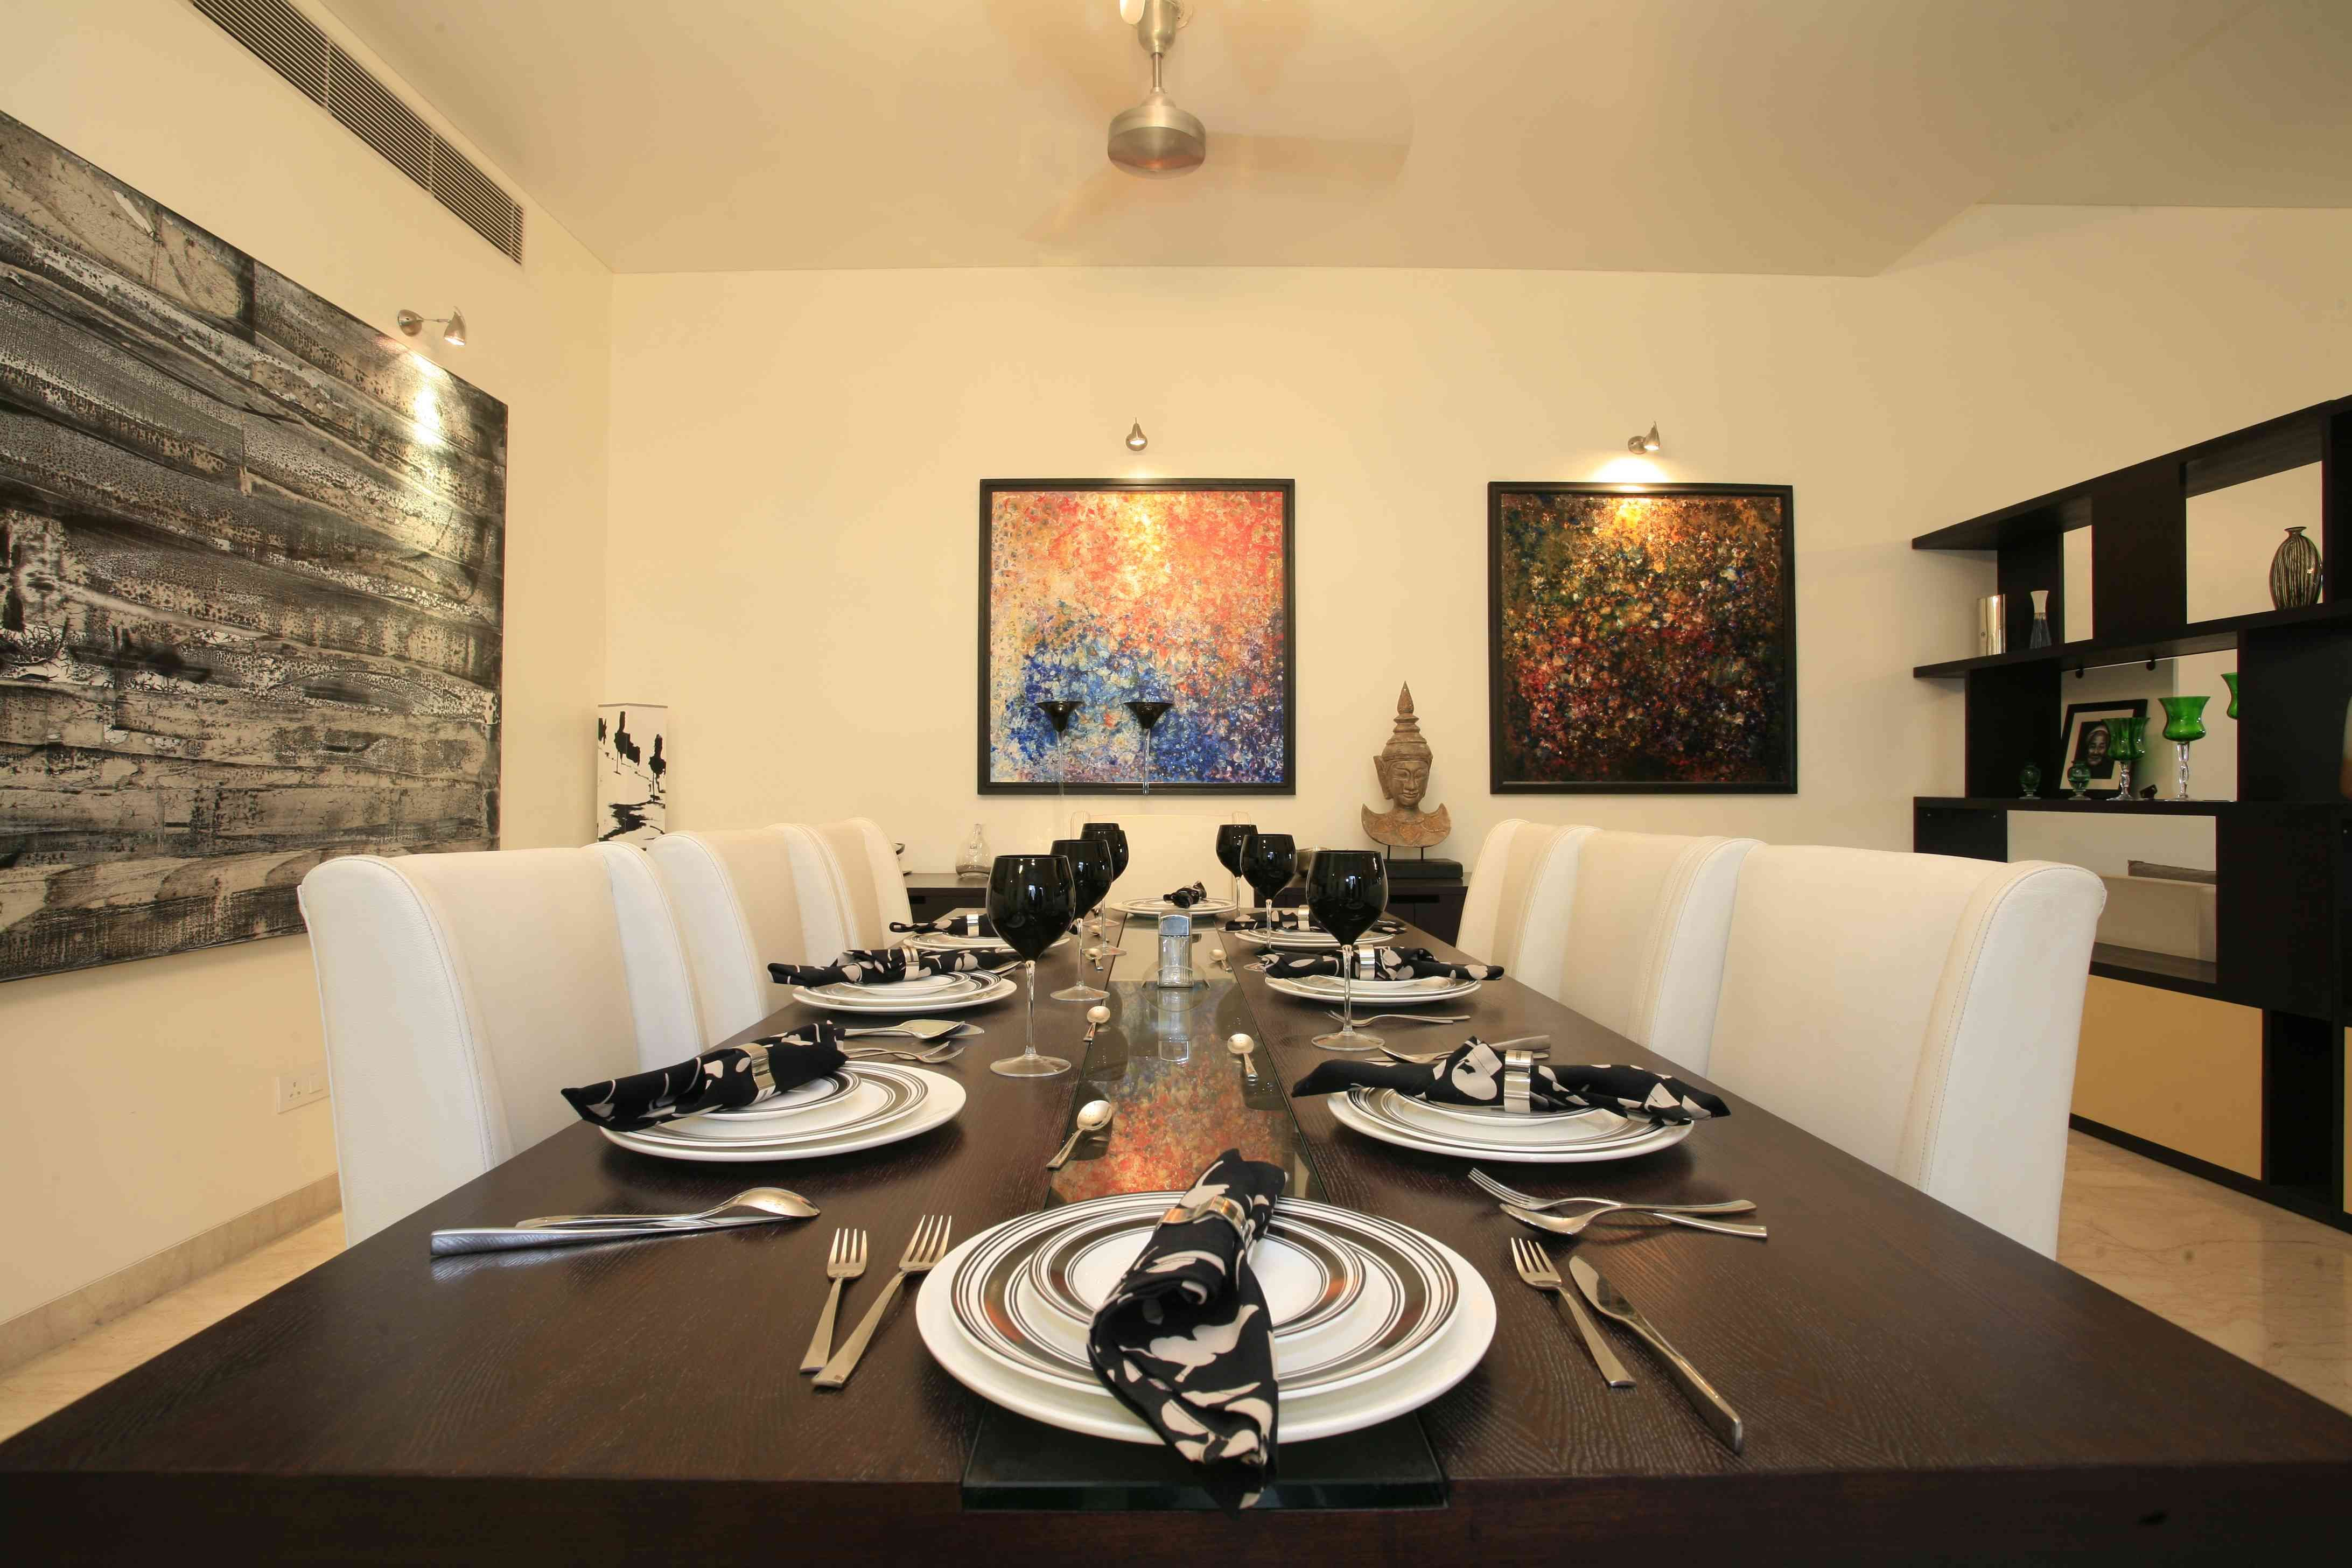 Design by Neha Chugh | Design, Dining room design, Indian ...